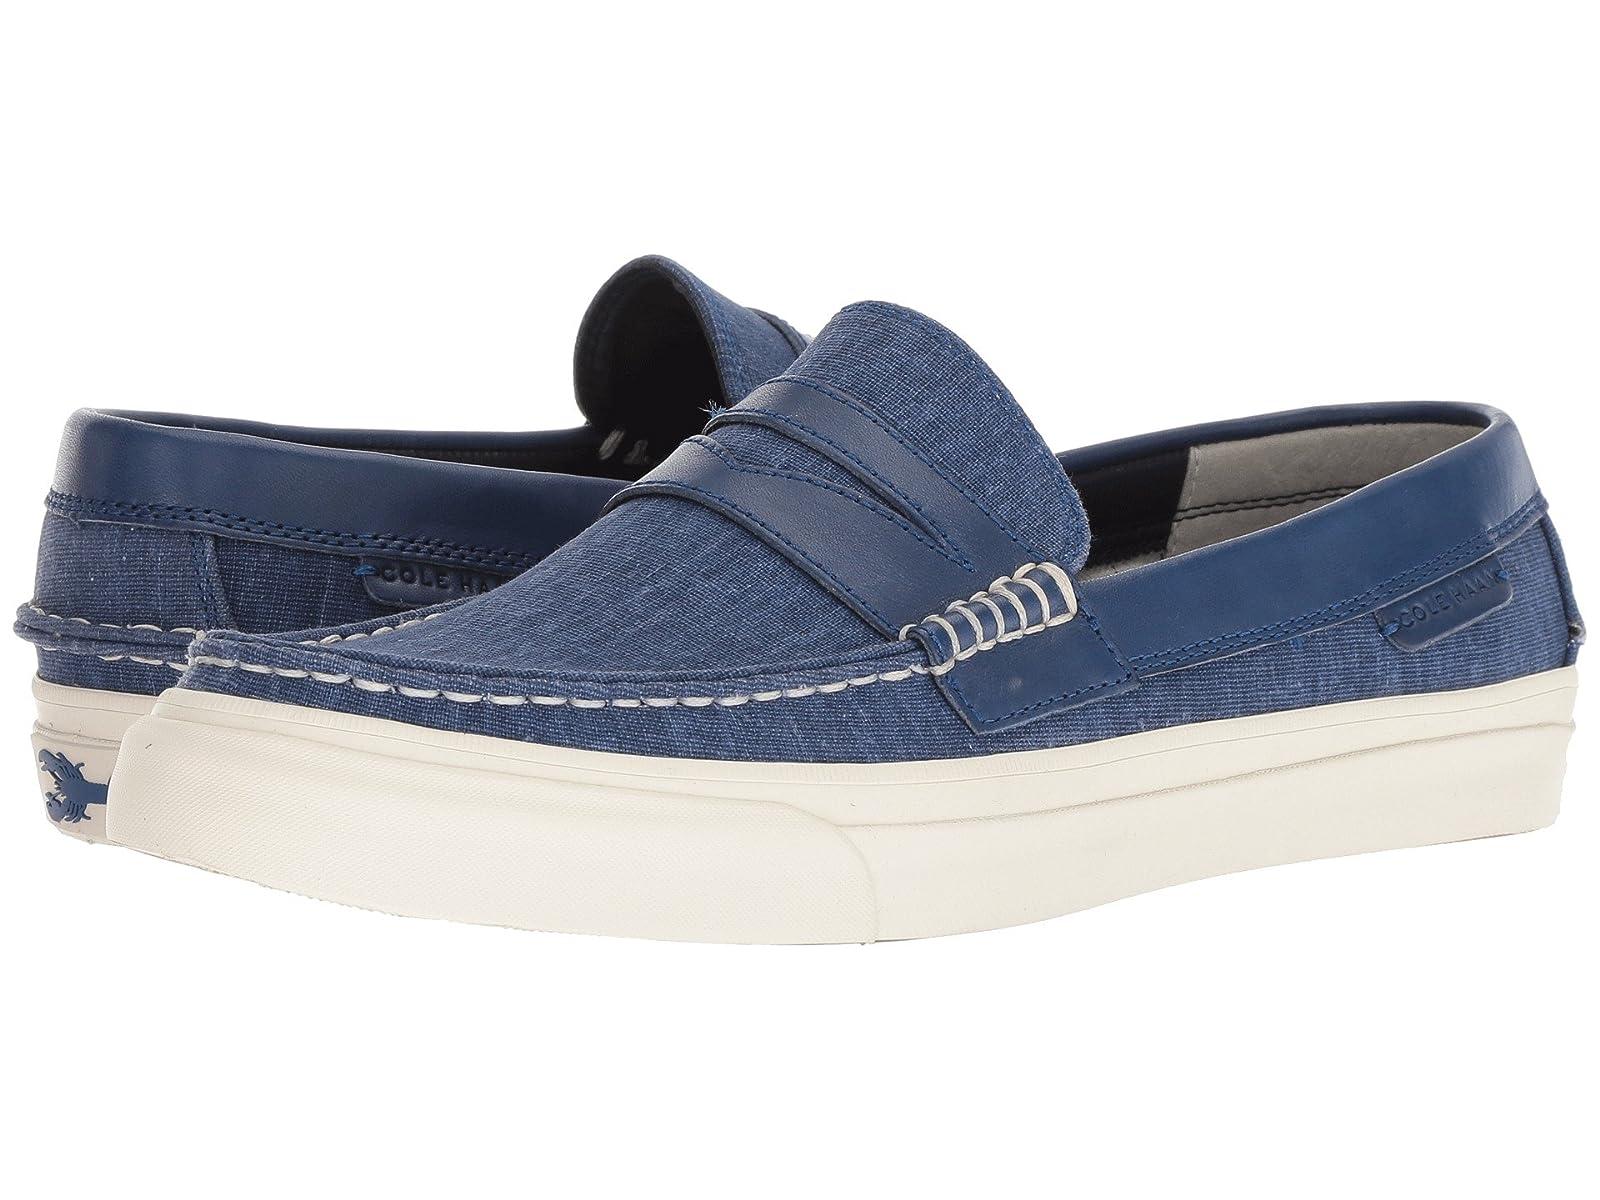 Cole Haan Pinch Weekender Luxe PennyAtmospheric grades have affordable shoes